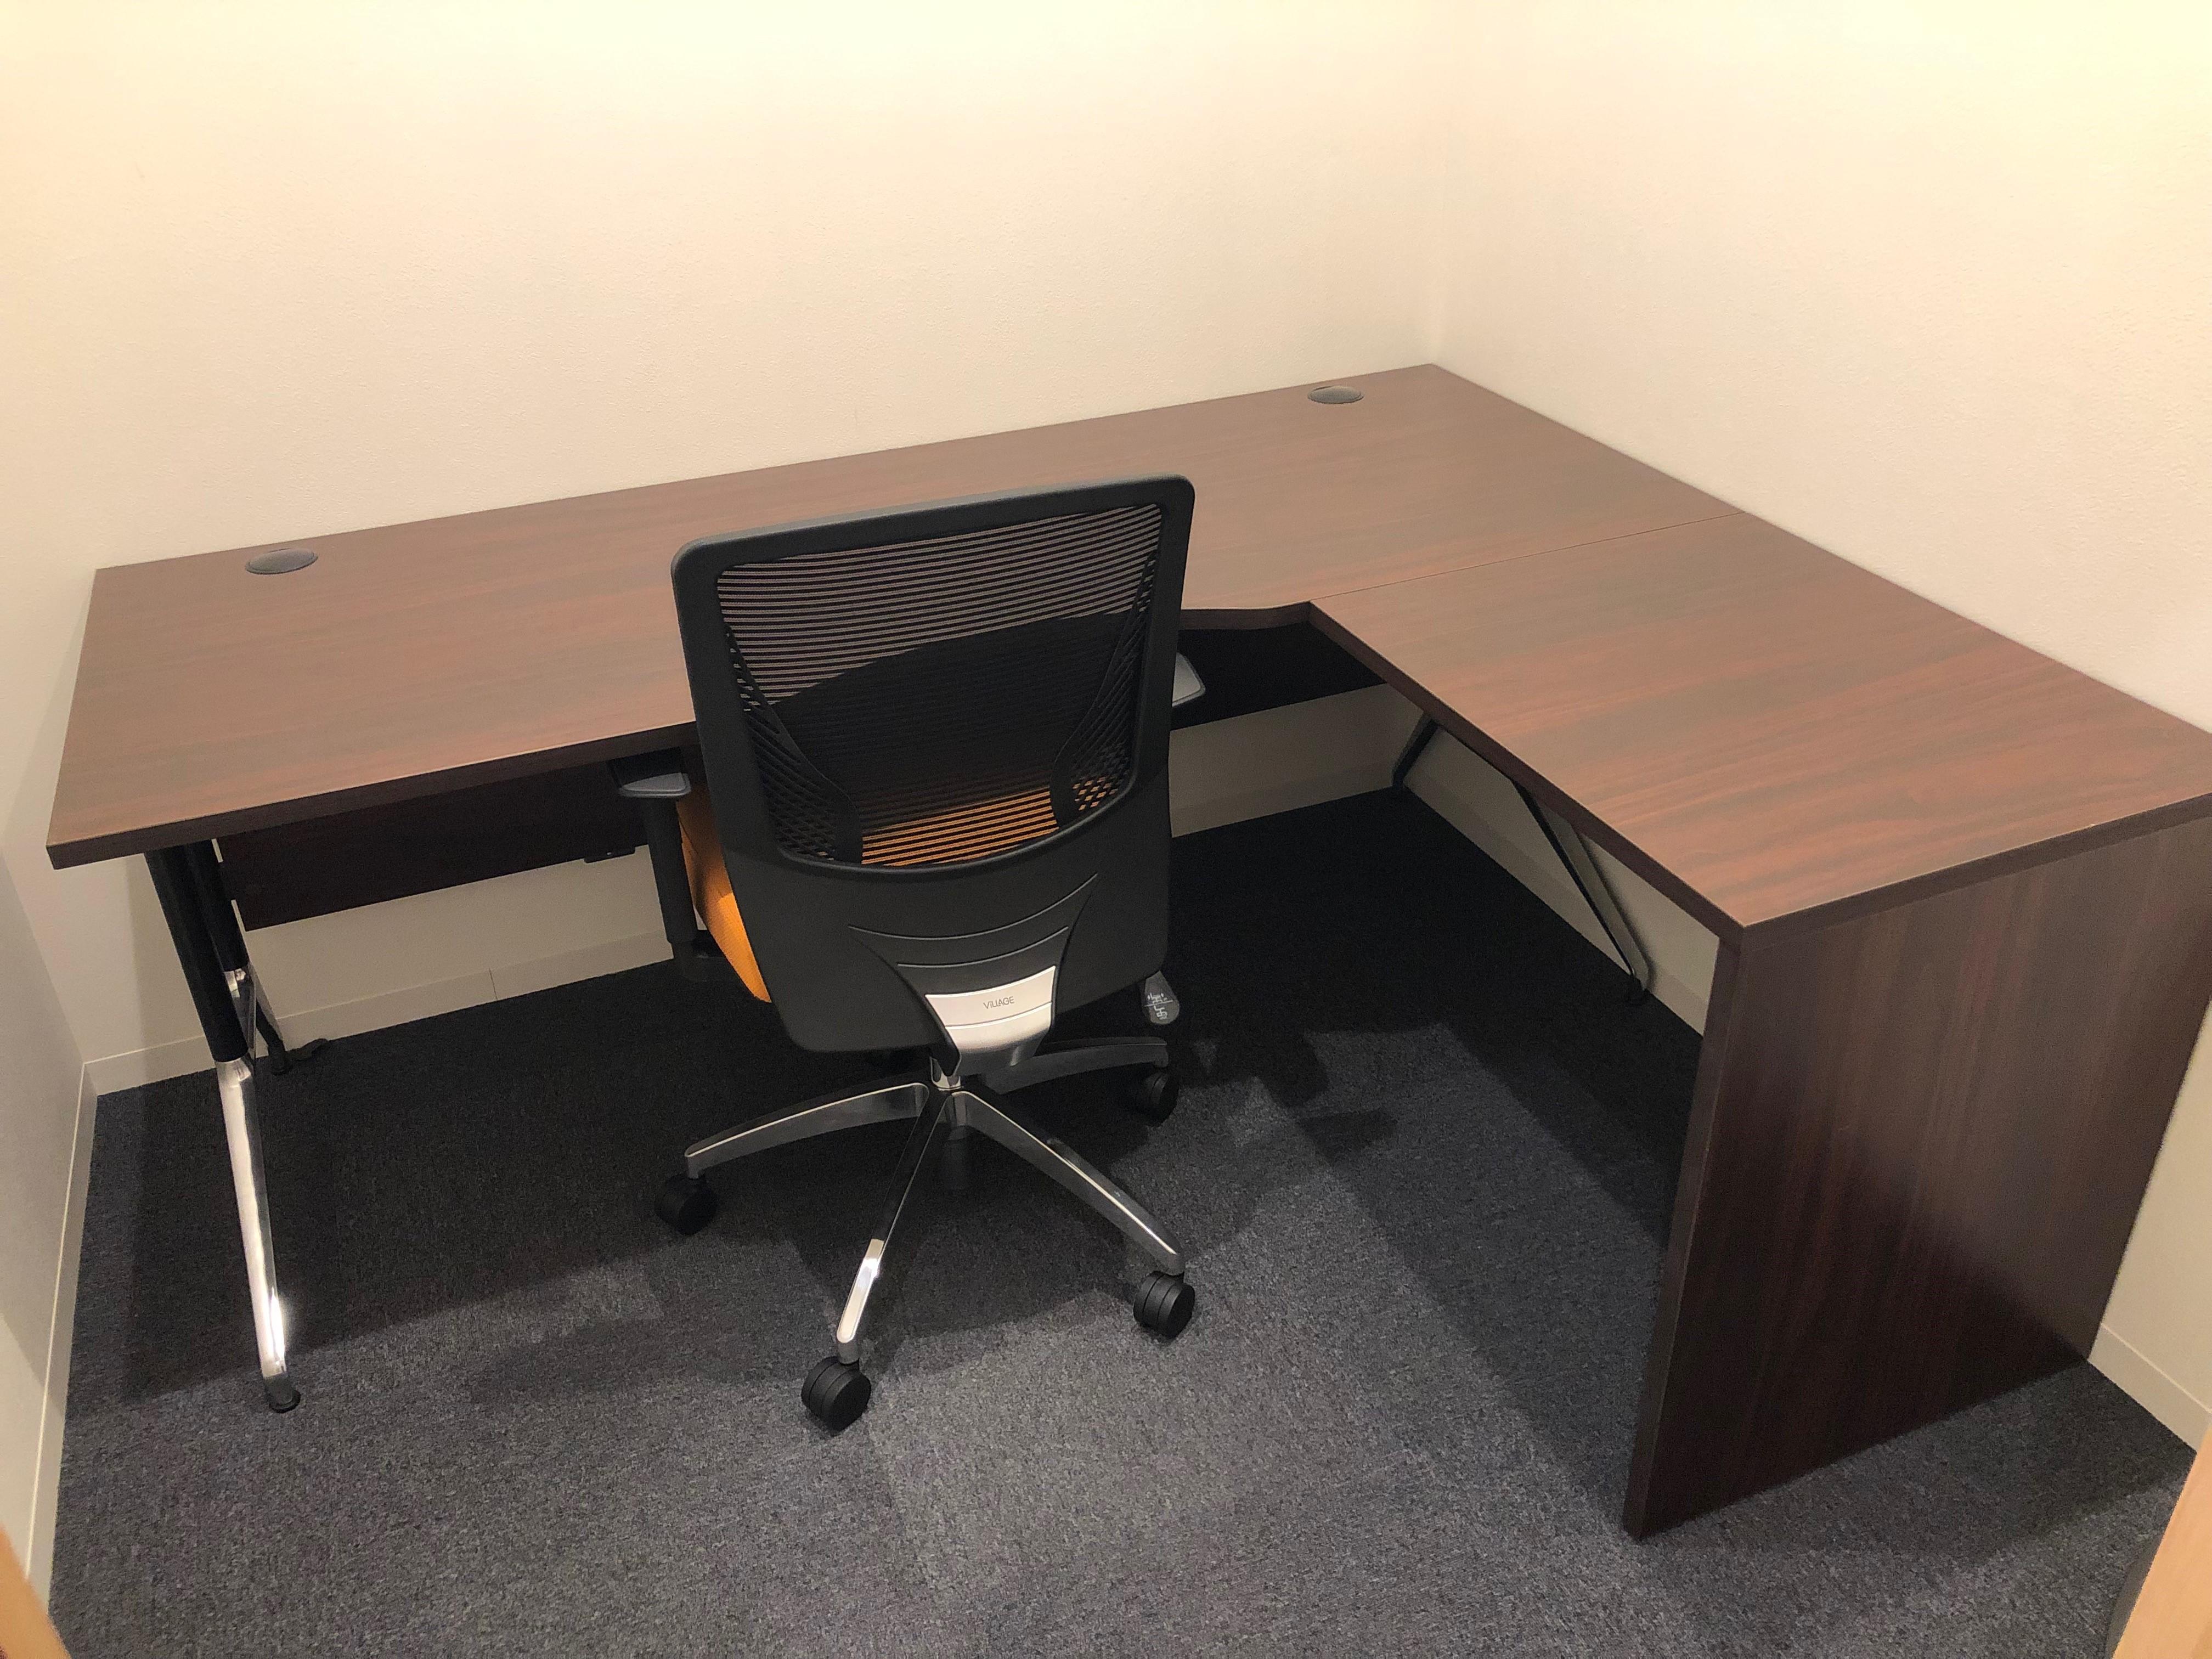 L字型パソコンデスクを採用した広い1名用オフィス★限定1室★